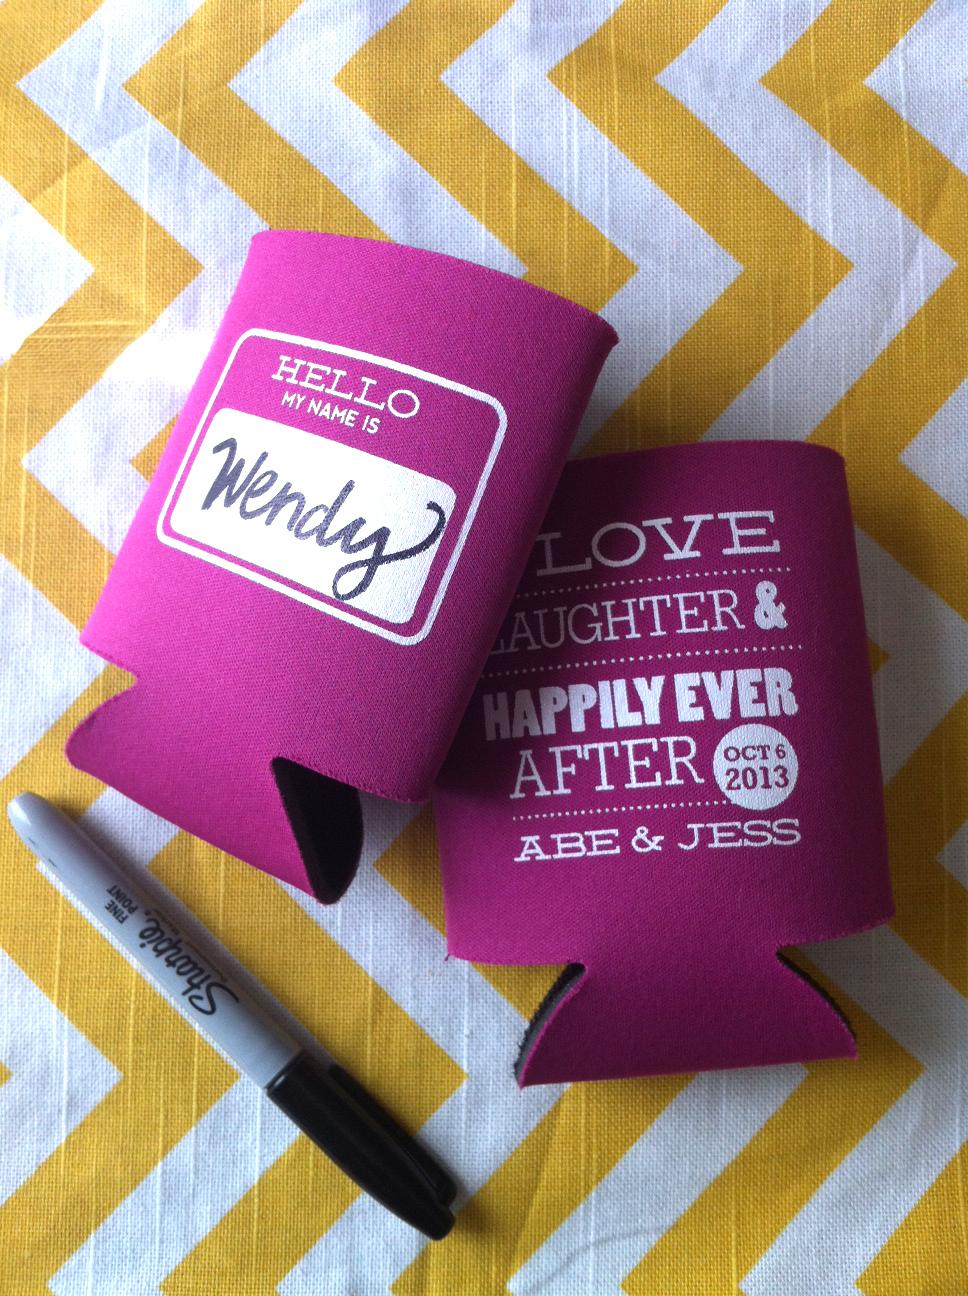 23 Most Creative Wedding Favor Koozies Ideas For Your Wedding Party Elegantweddinginvites Com Blog